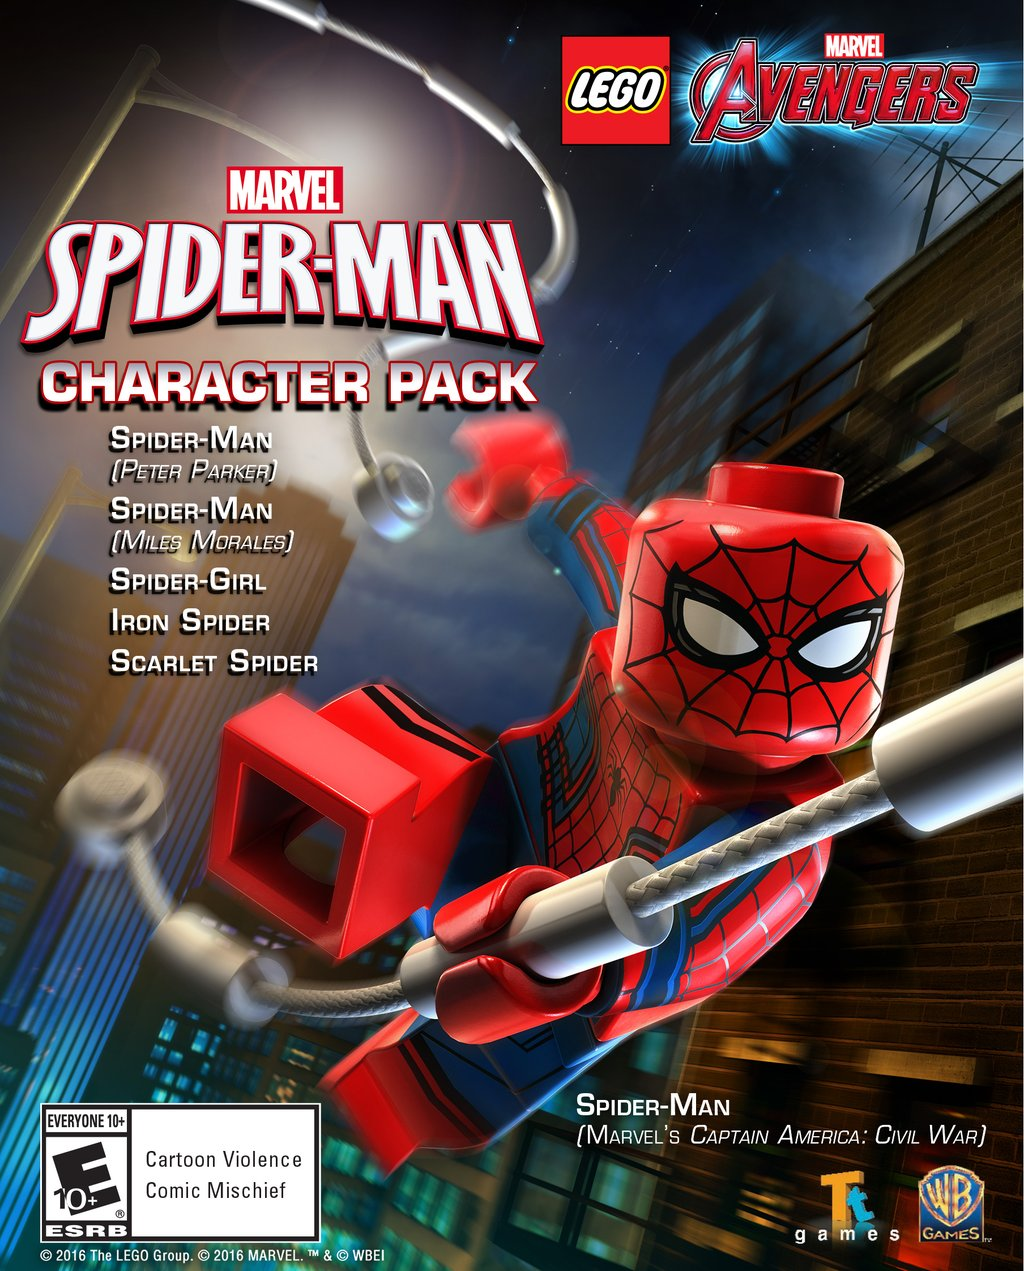 Lego marvel's avengers deluxe edition скачать.